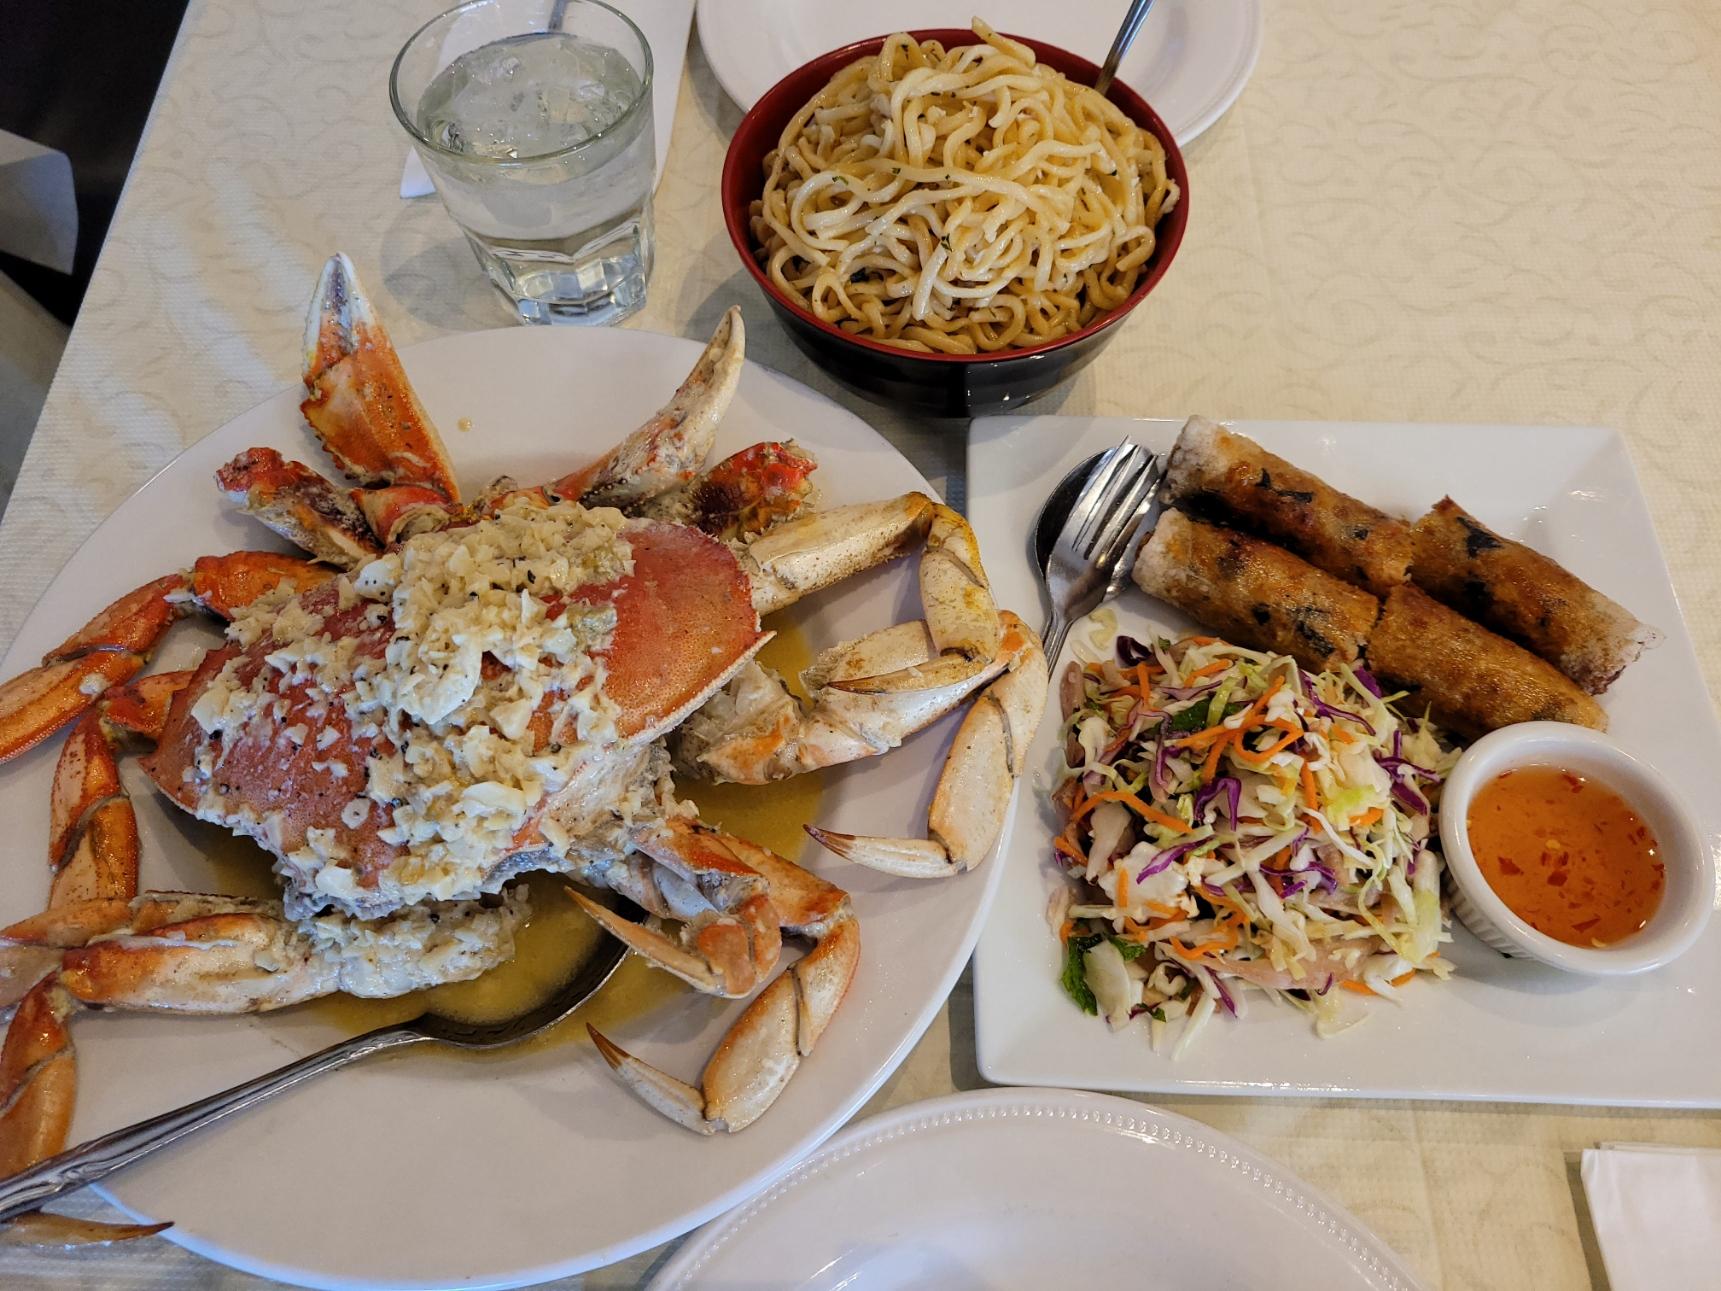 Crab Dinner for 2